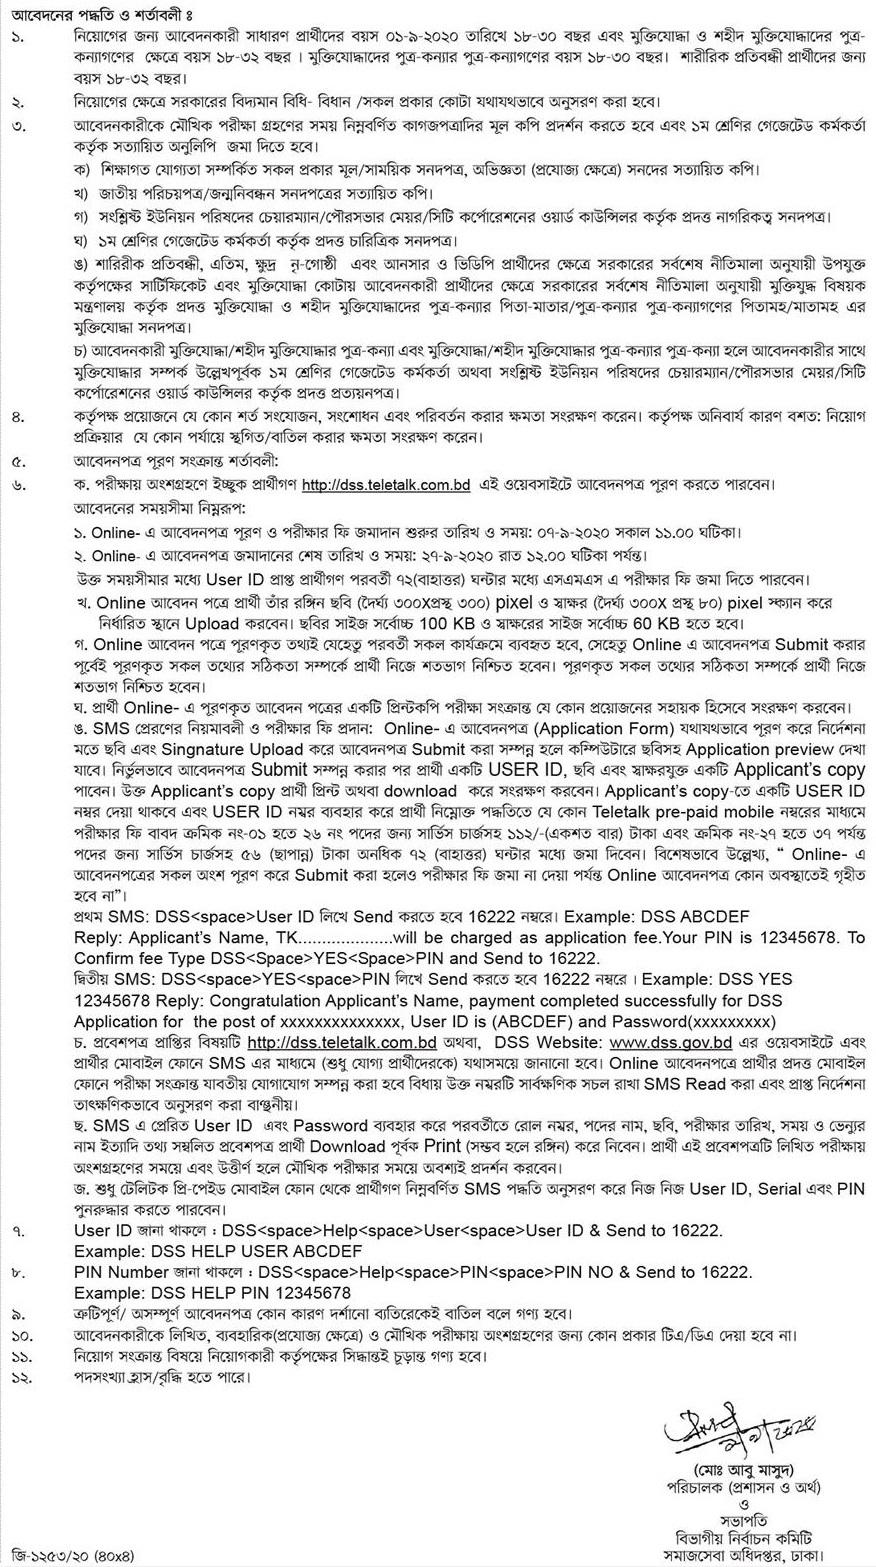 DSS Teletalk BD 2020 - dss.teletalk.com.bd